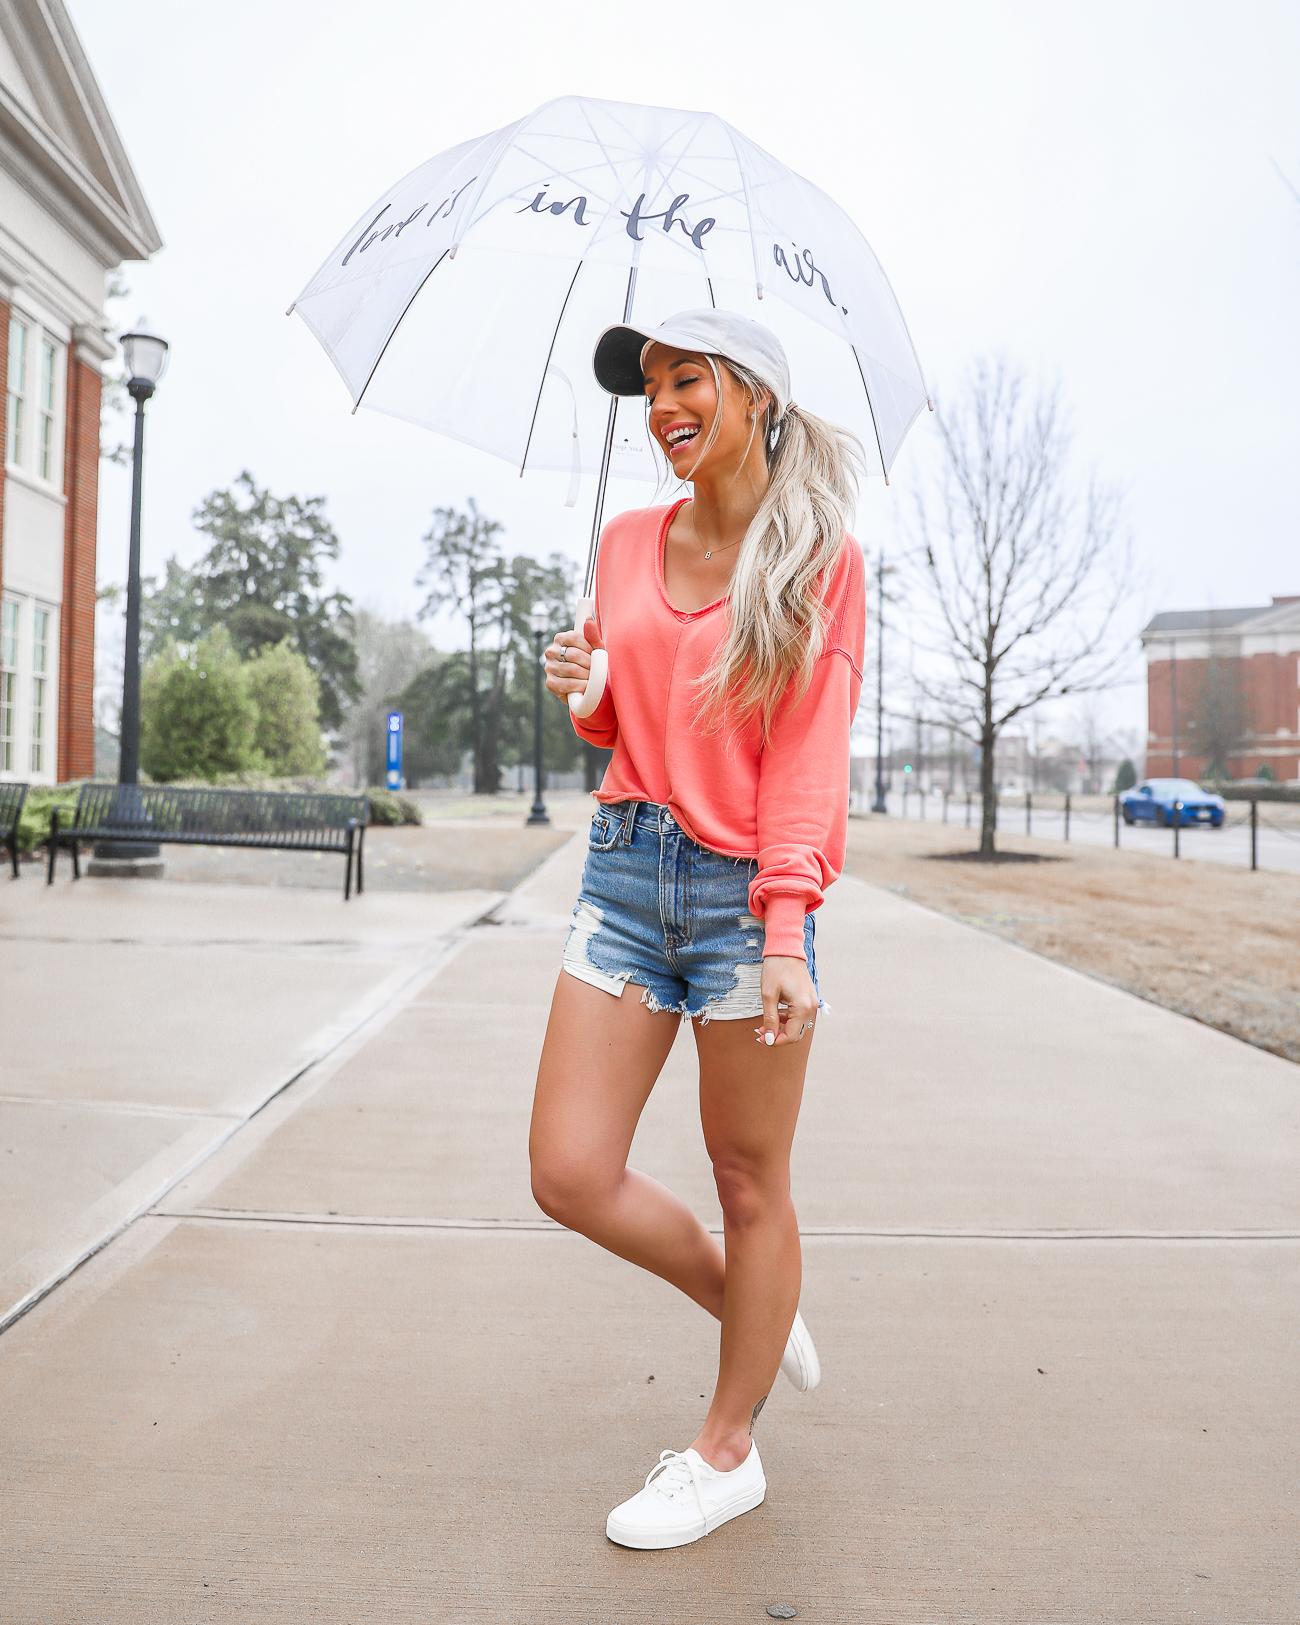 Abercrombie Summer Outfit Coral Cropped sweatshirt Denim cutoff shorts Kate Spade Umbrella Laura Beverlin Rain Picture-21